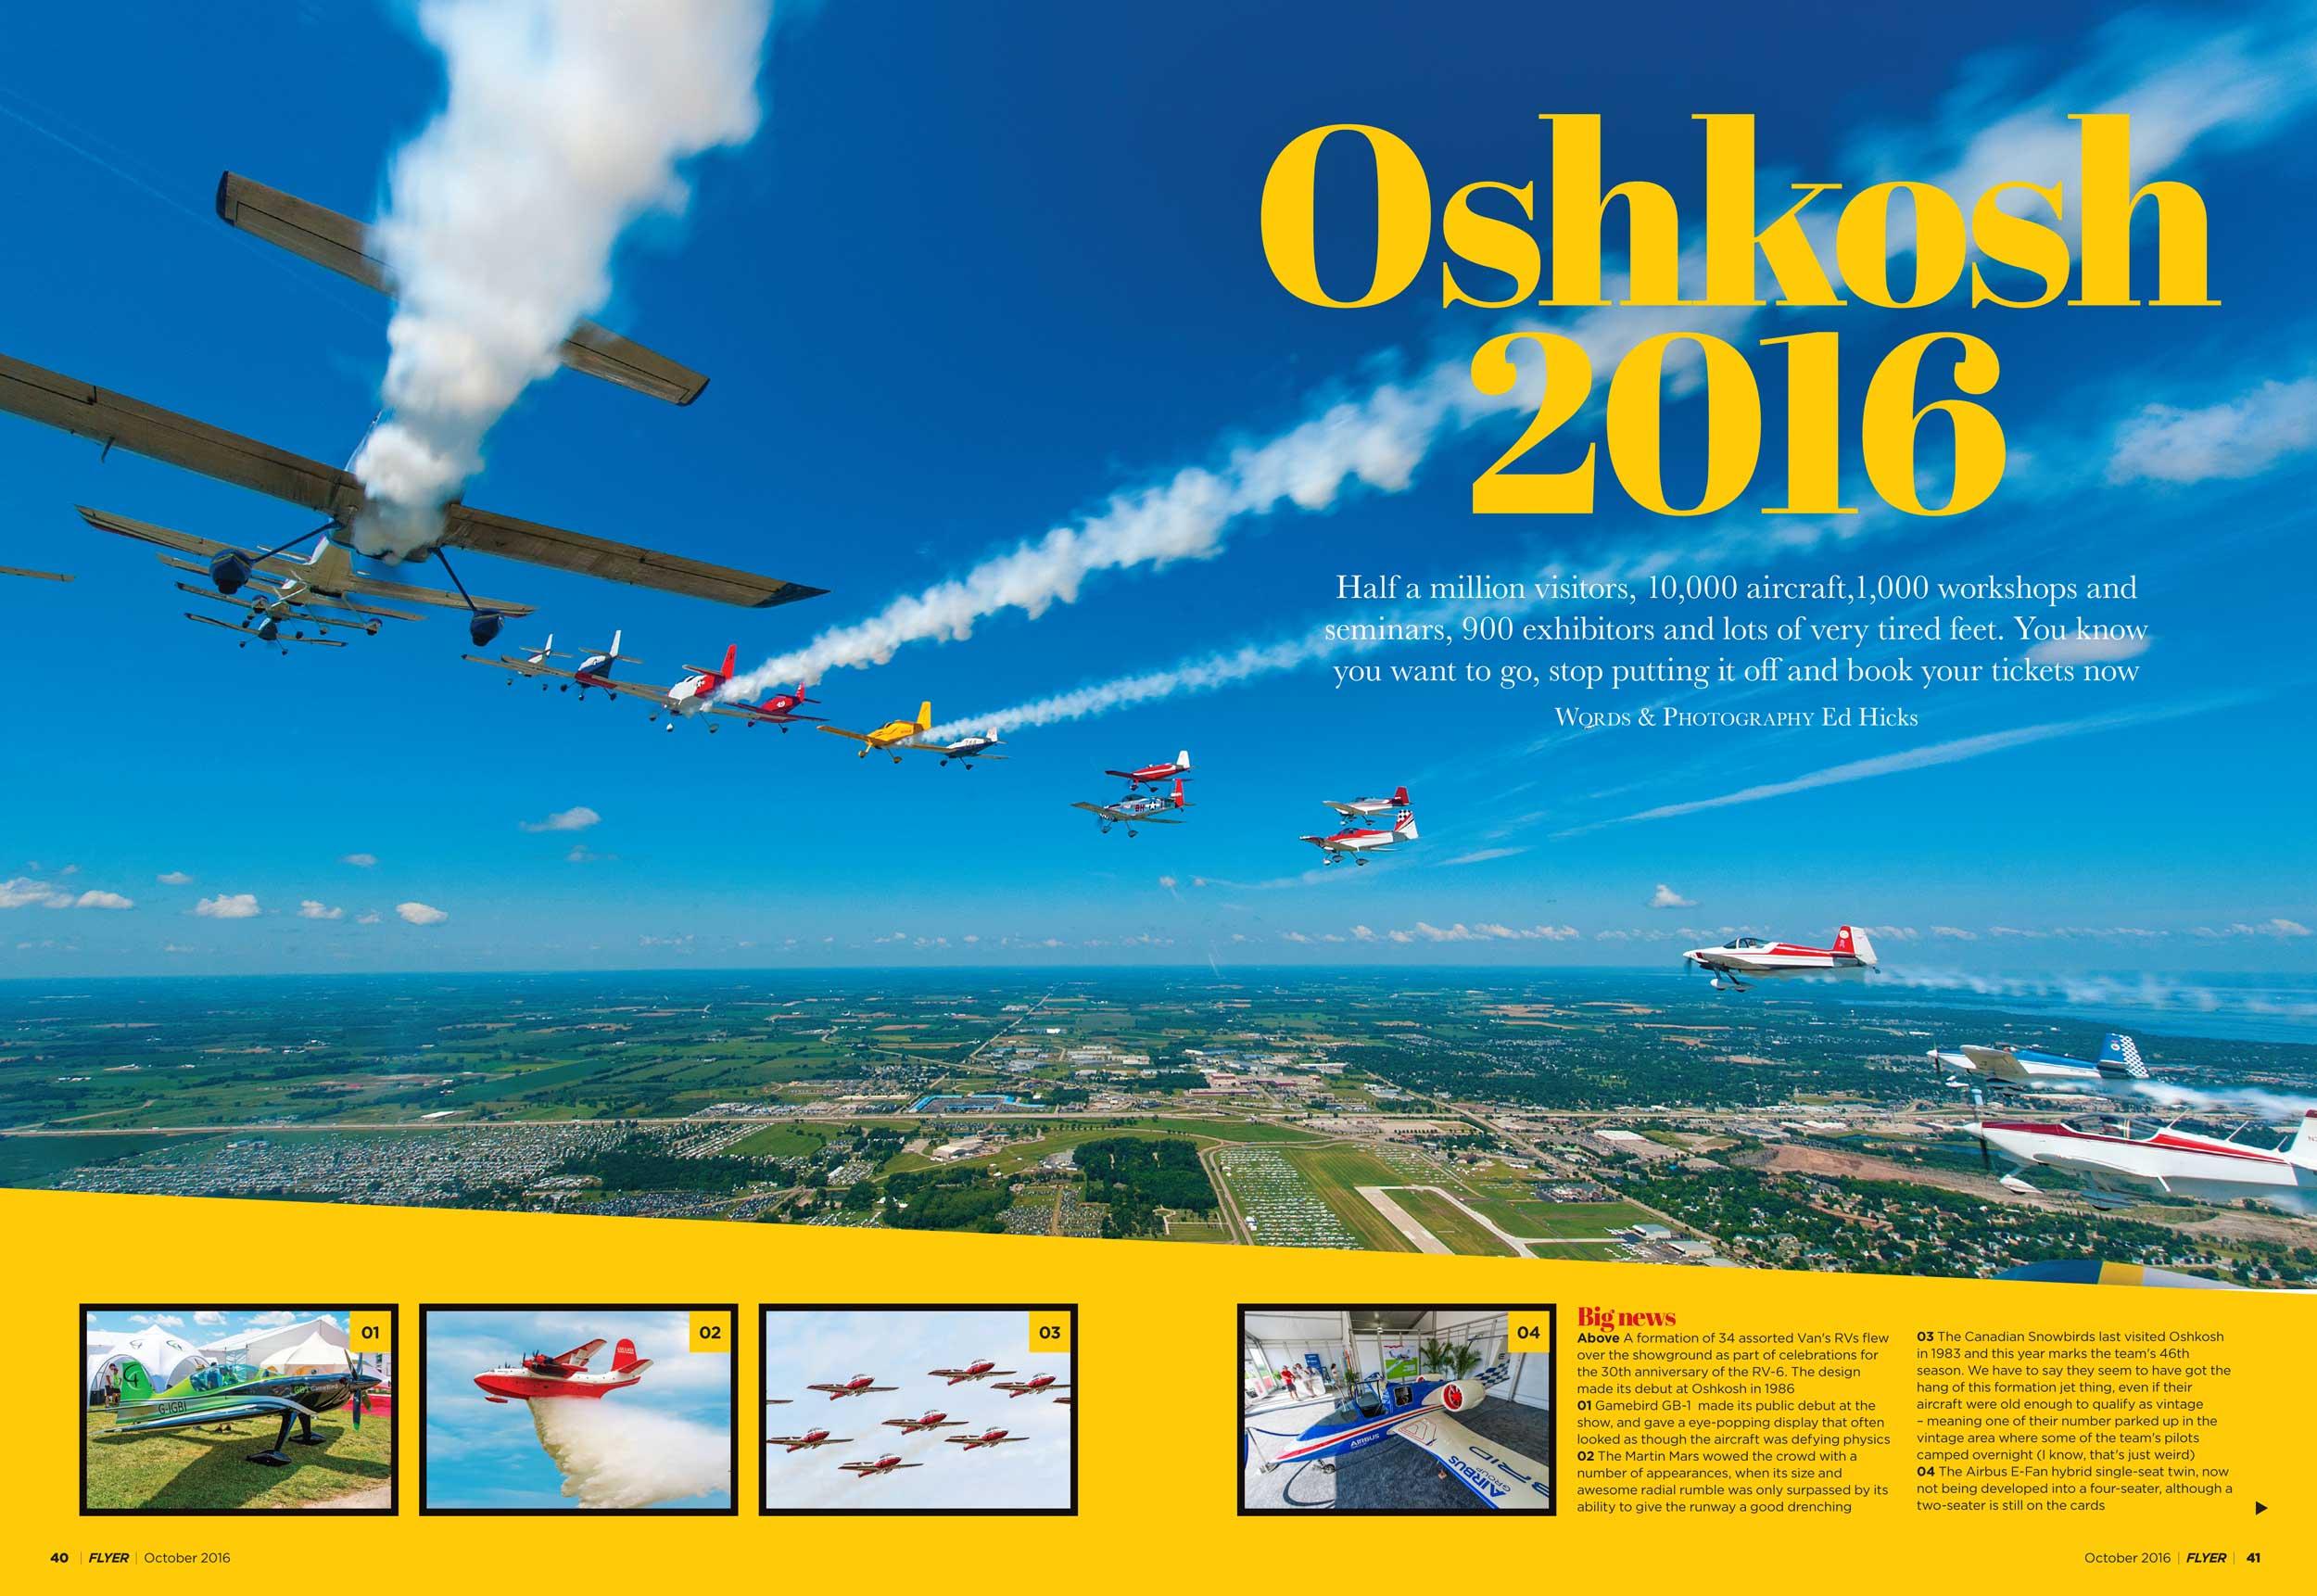 Oshkosh 2016 report